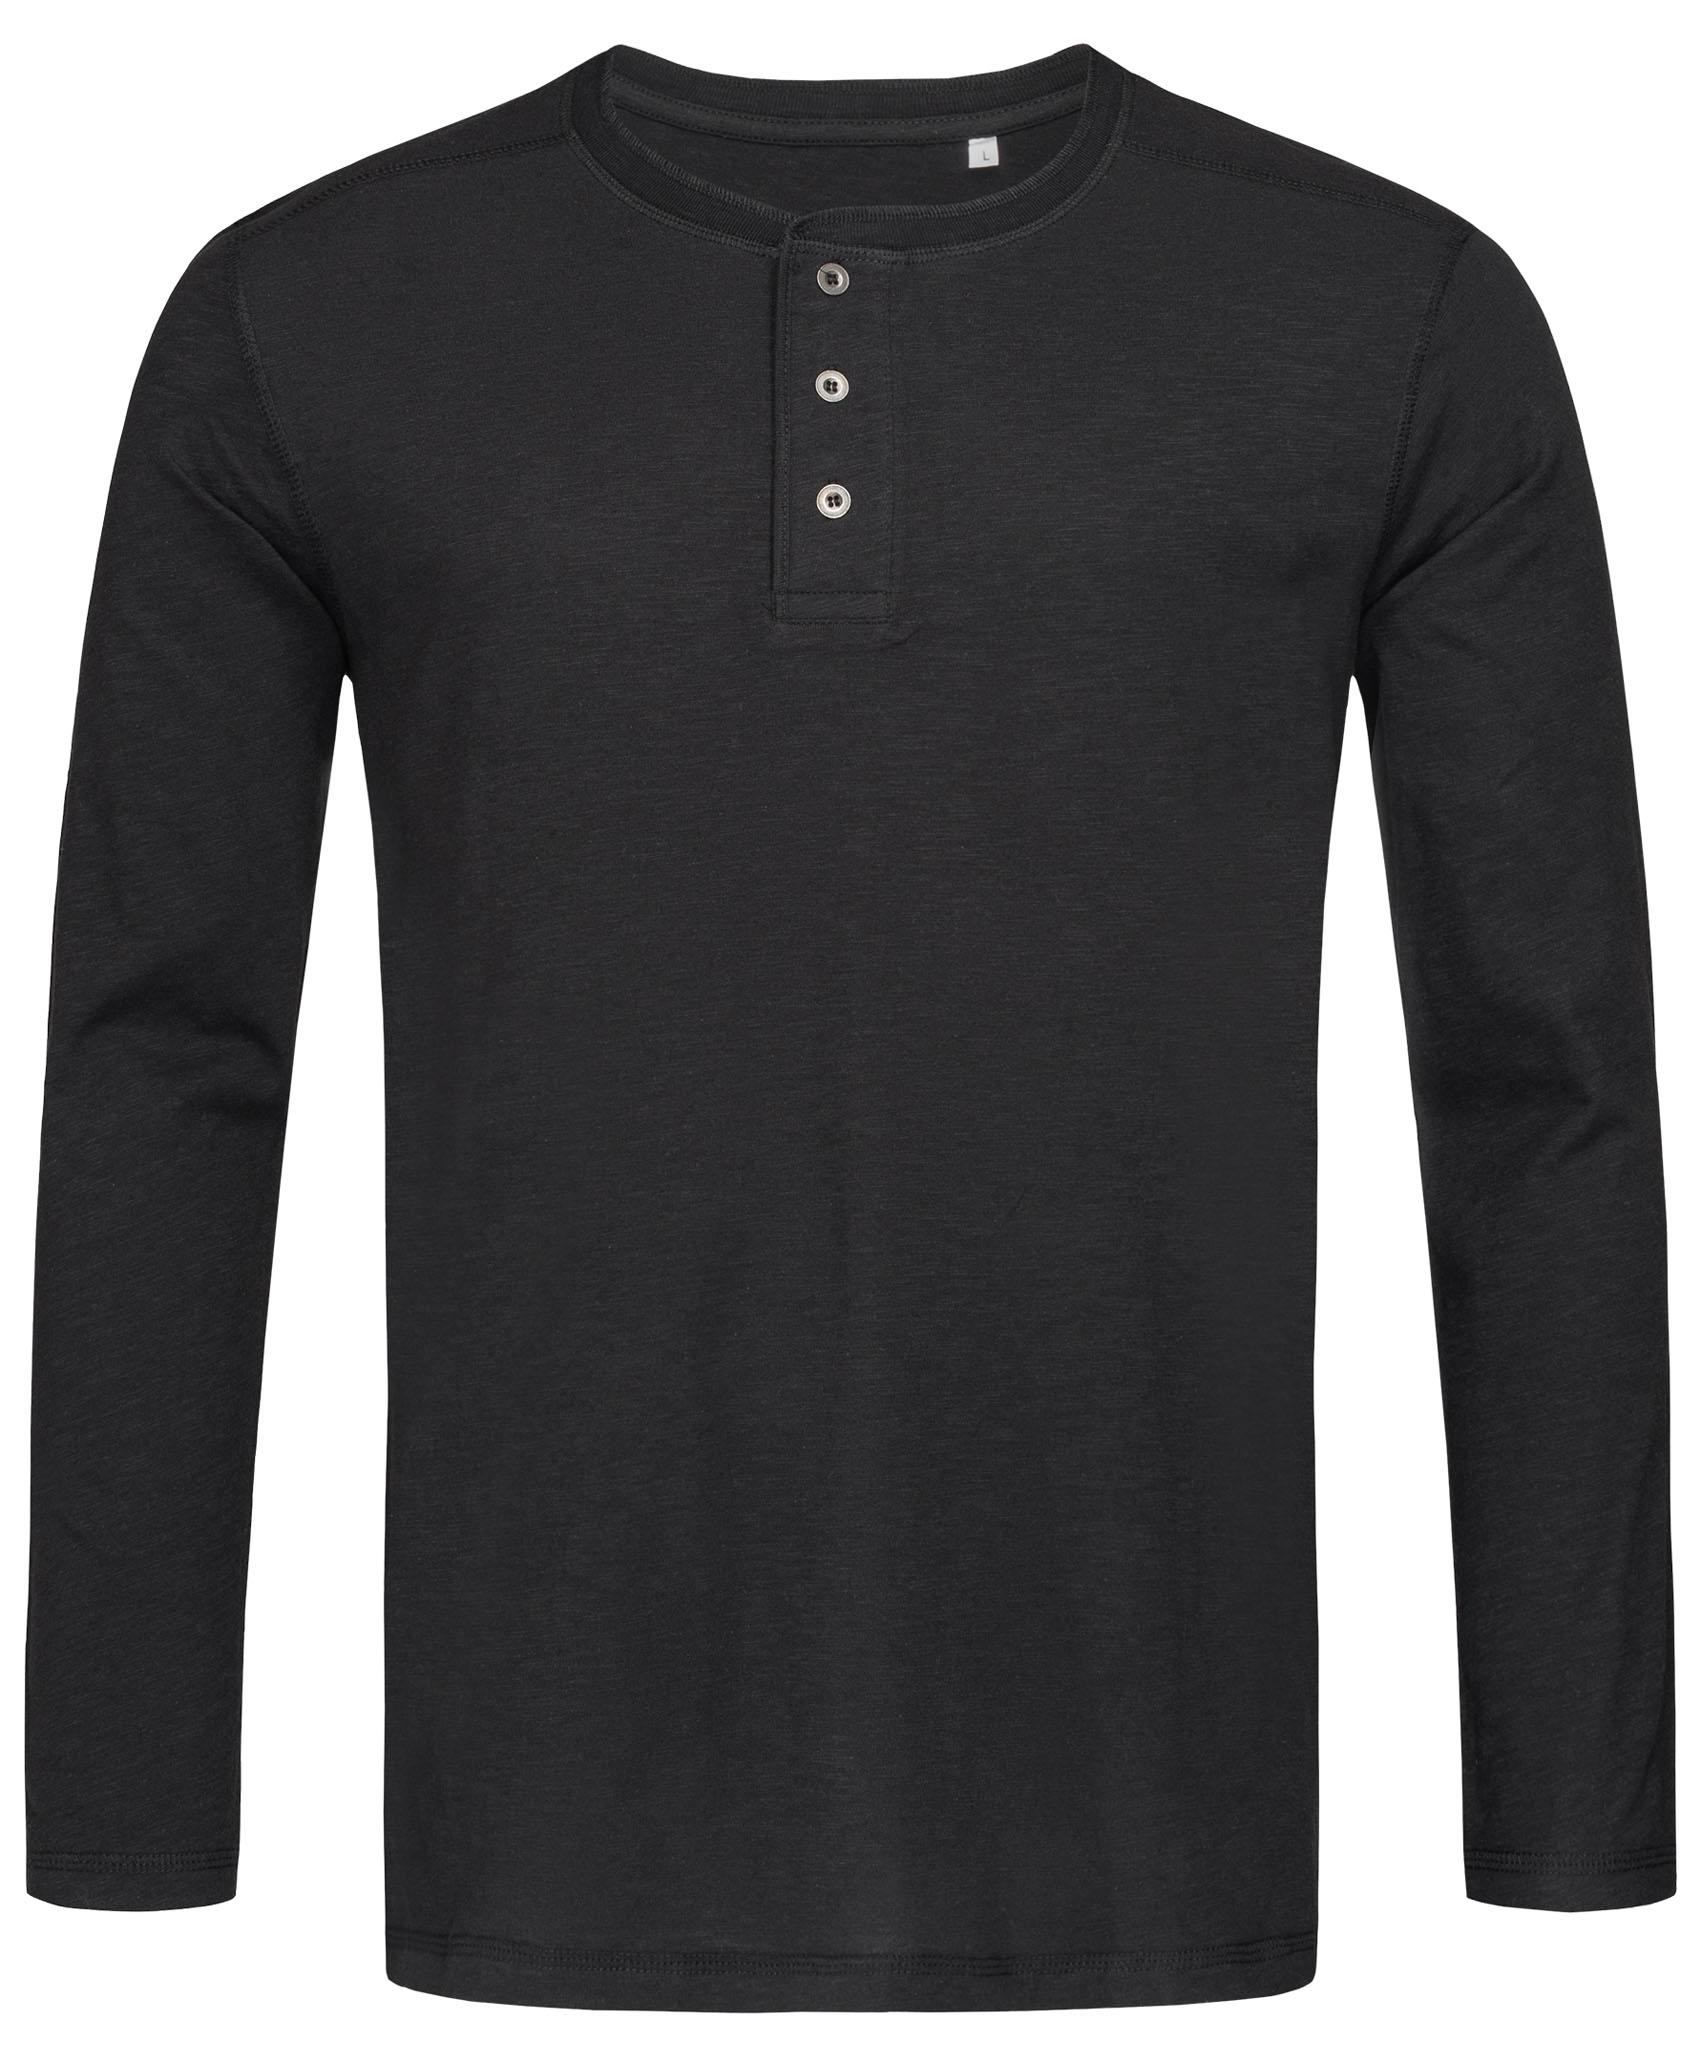 Stedman T-shirt Long Sleeve Henley Shawn for him